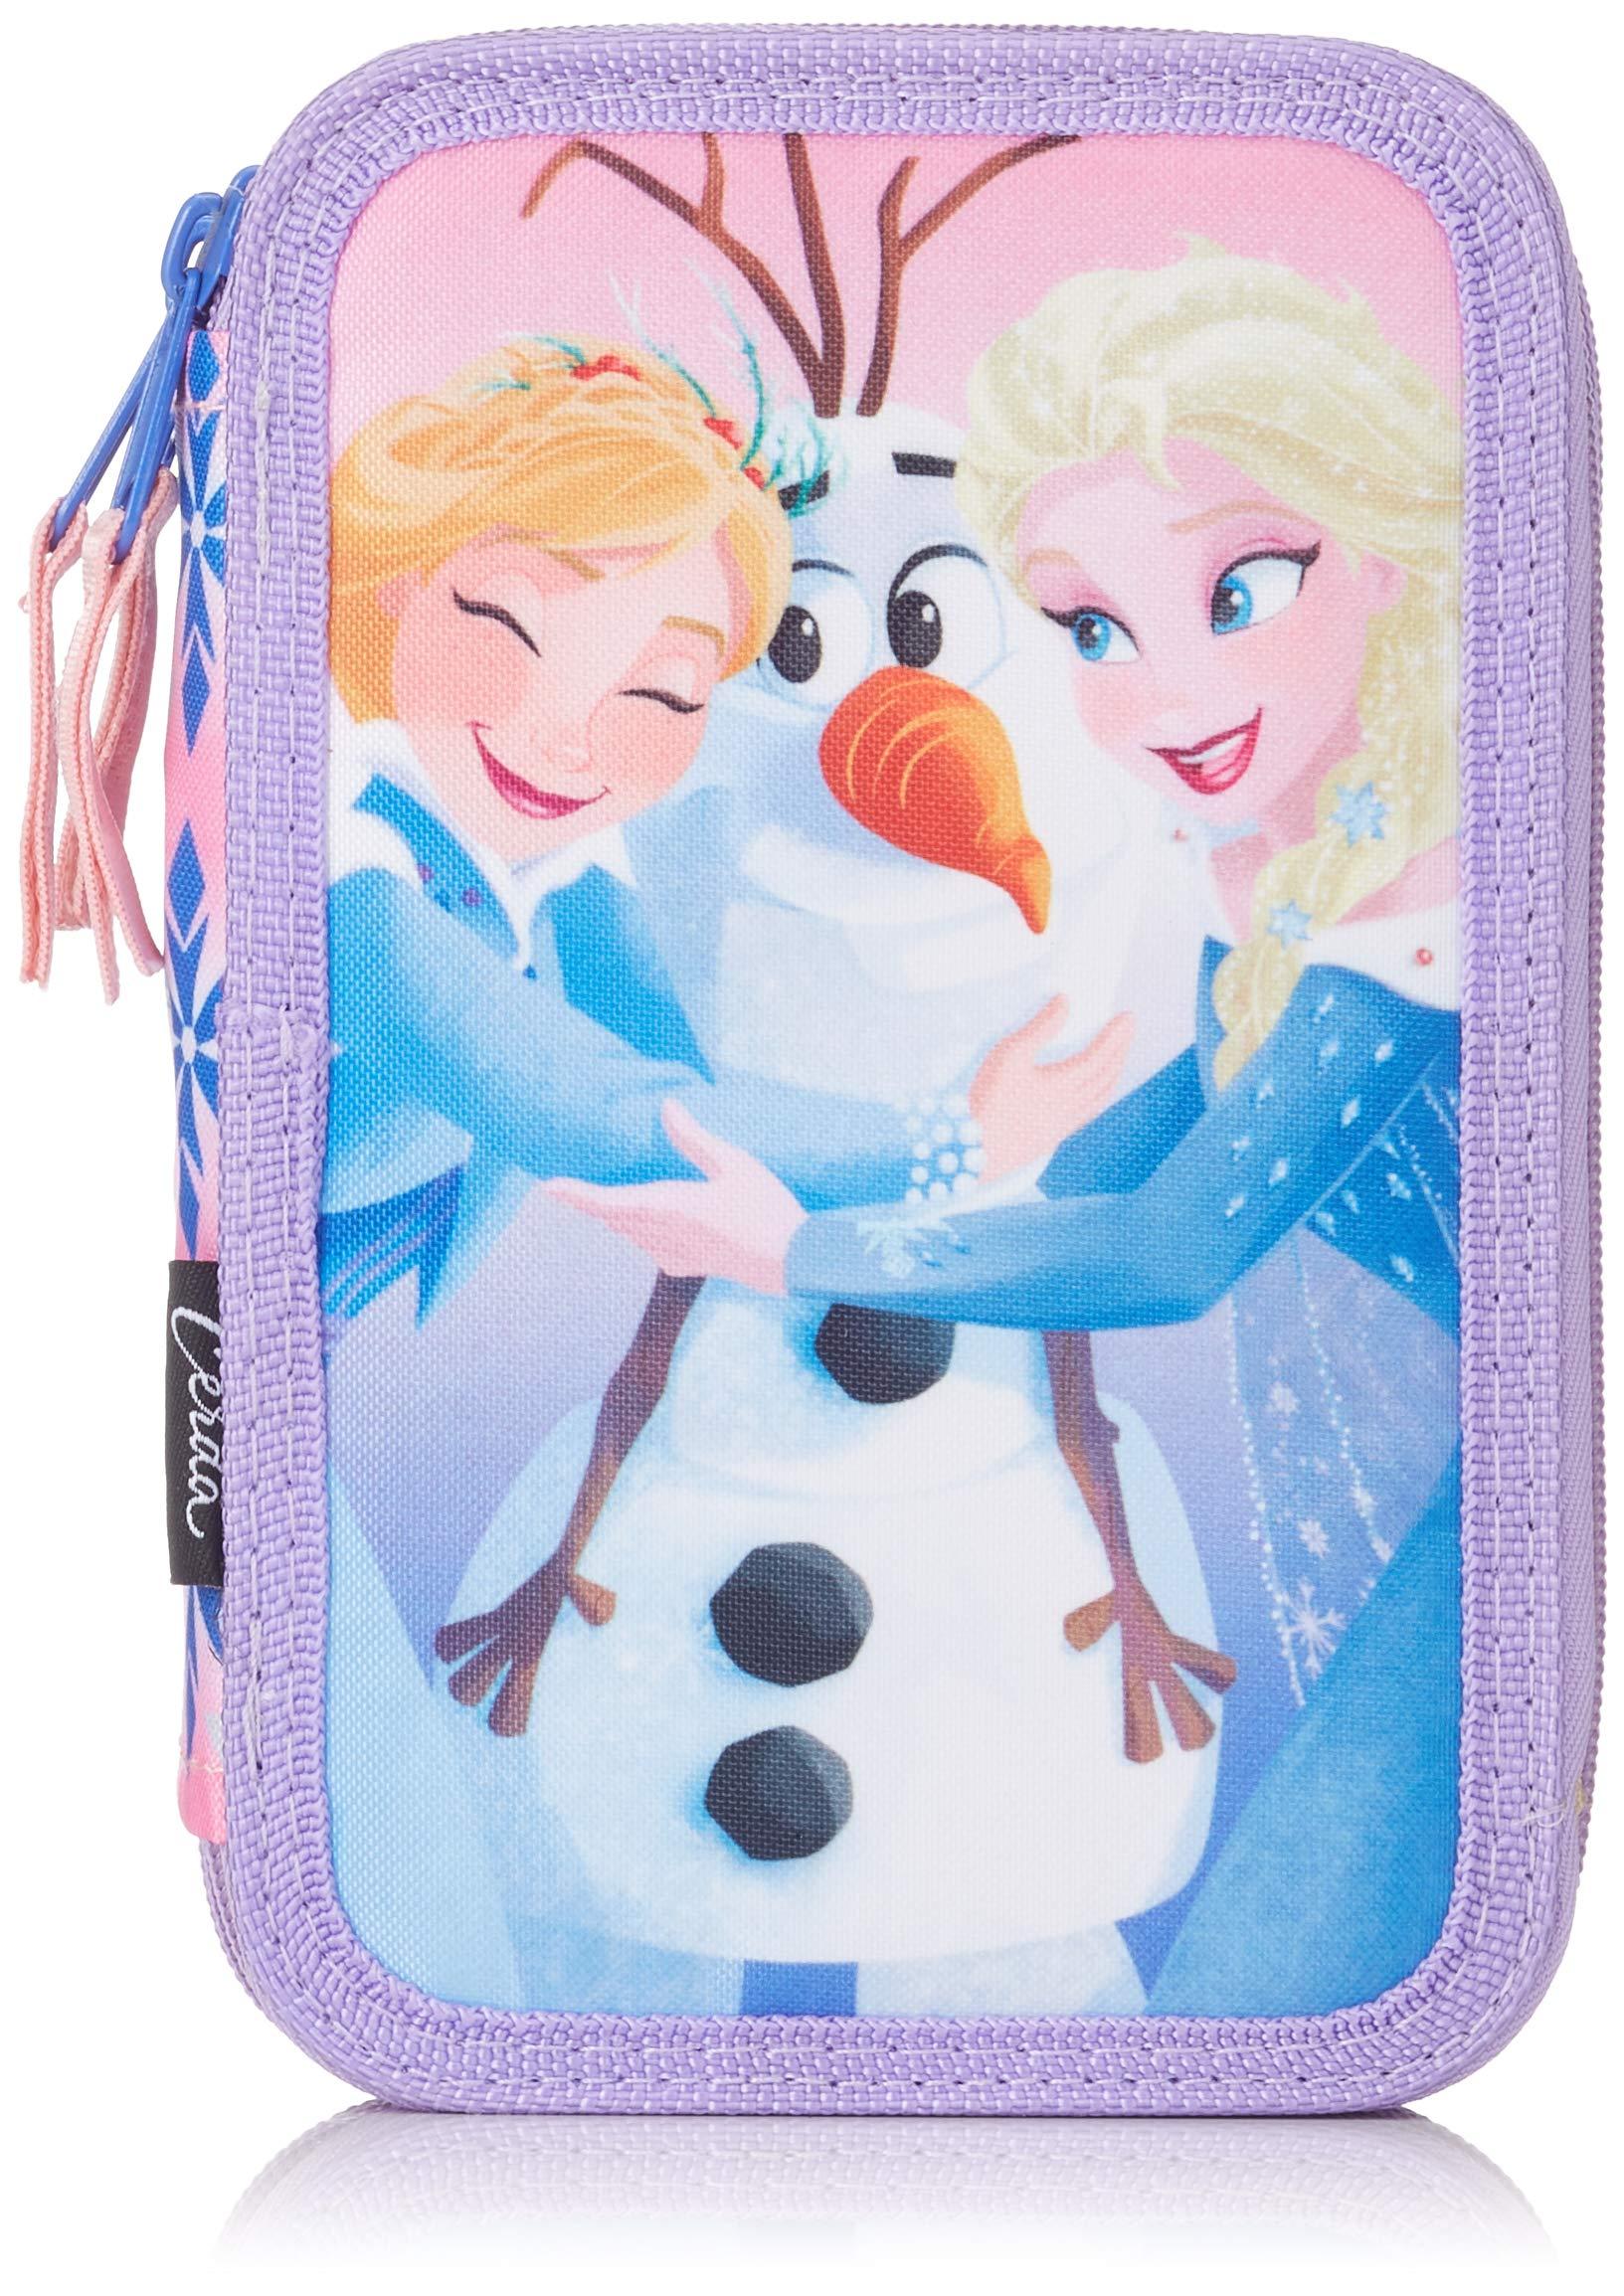 Disney-2700000245 Frozen Plumier,, 19 cm (Artesanía Cerdá CD-27-0245)